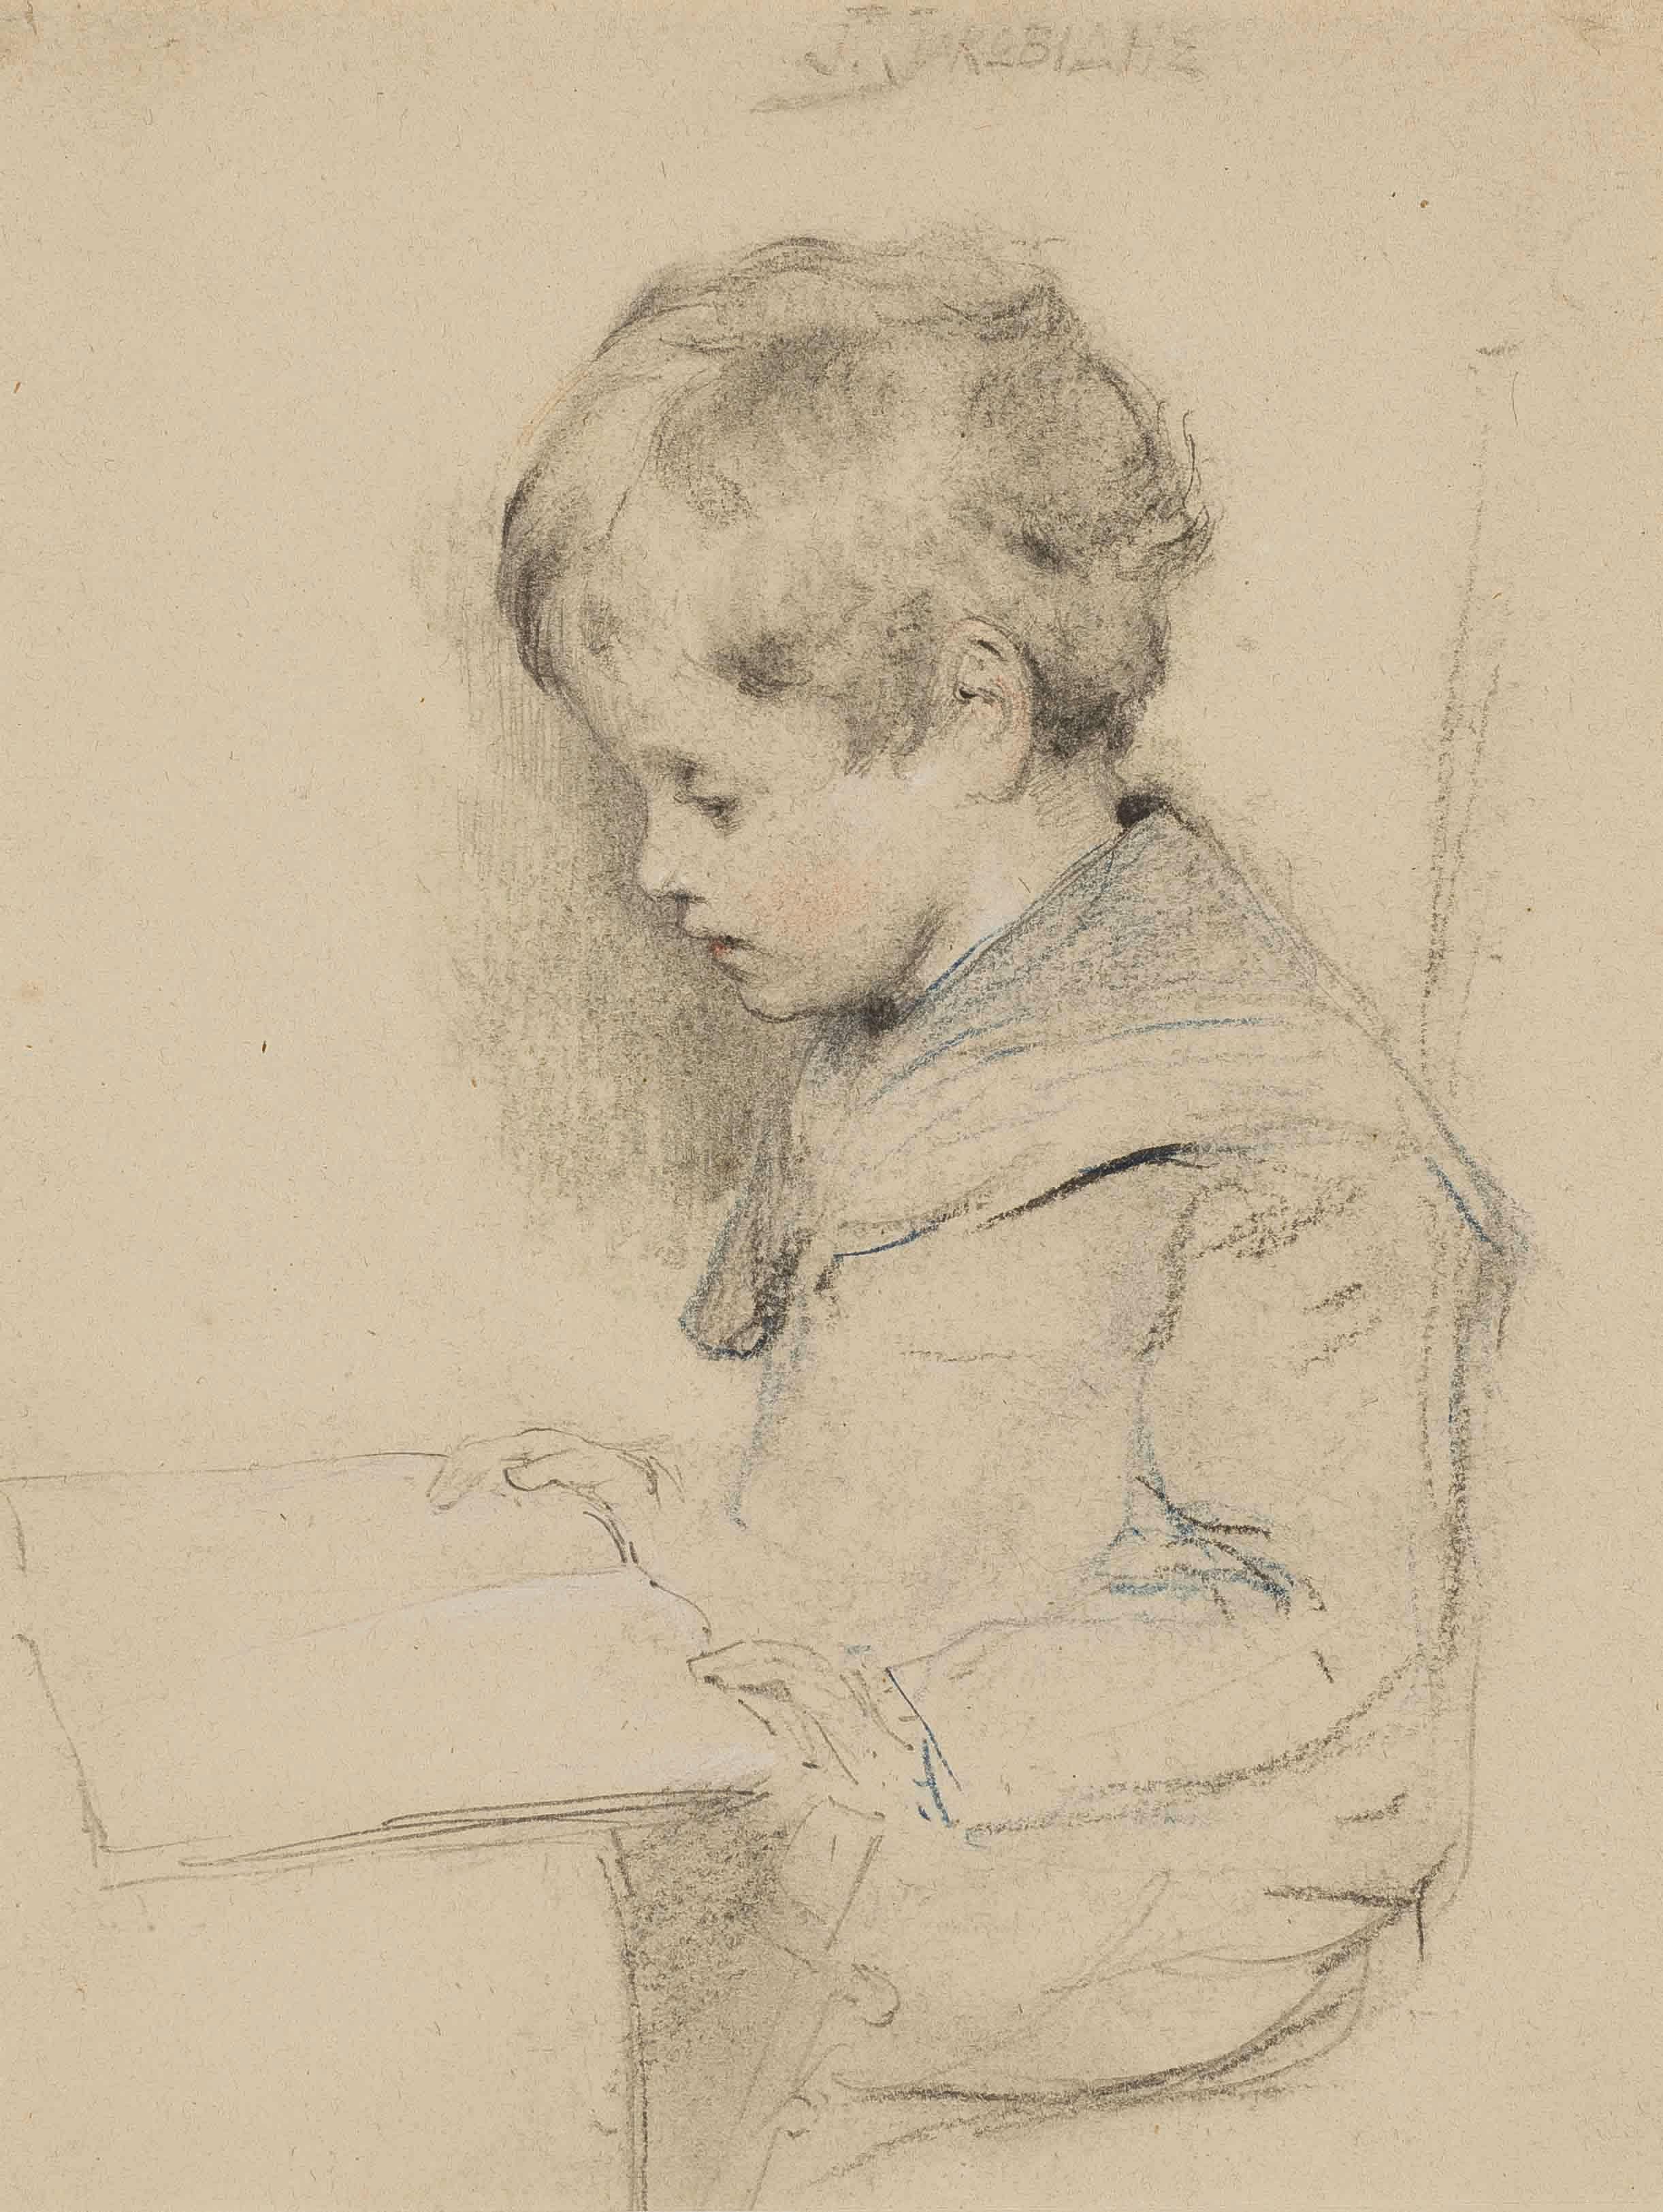 Jeune garçon assis lisant